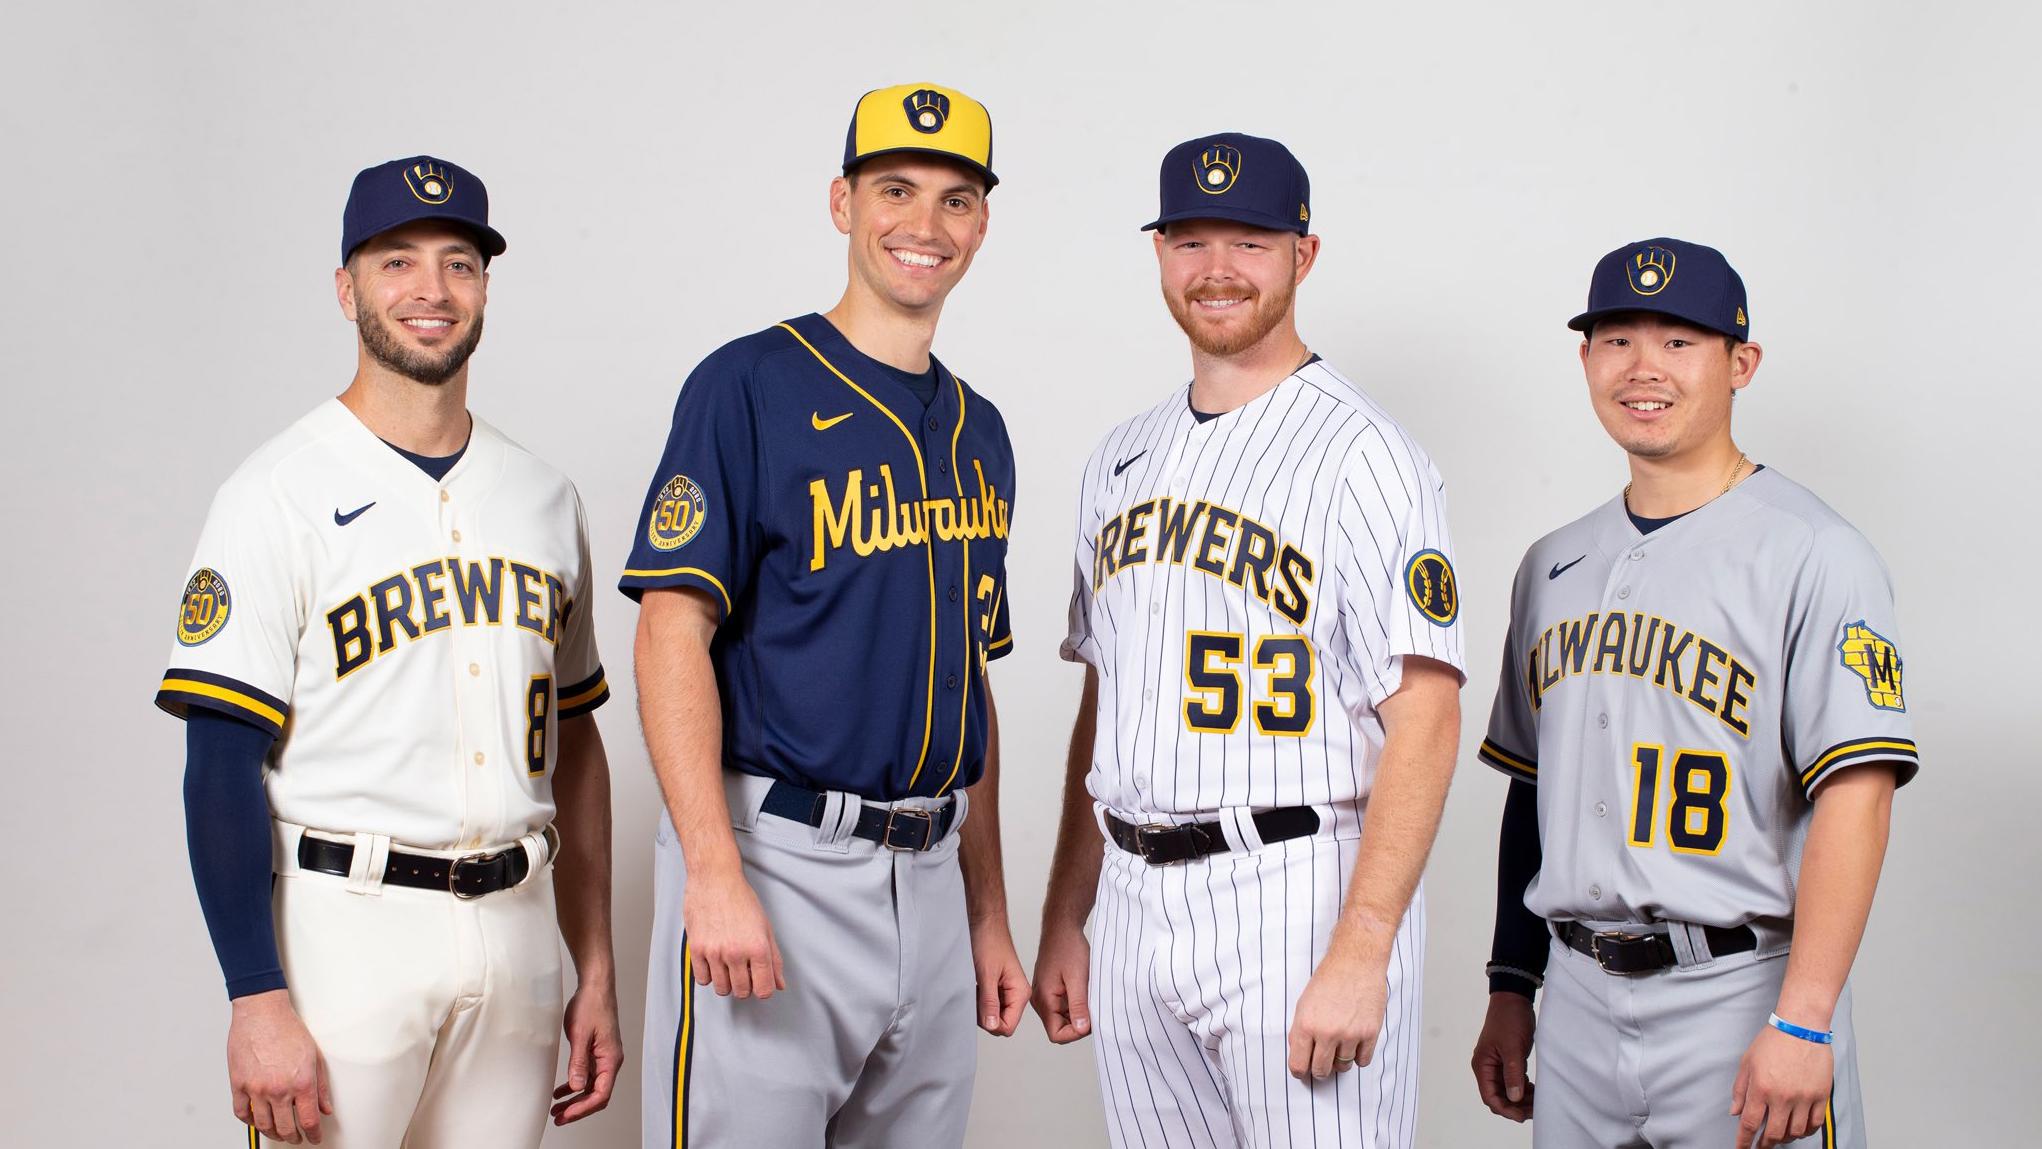 Milwaukee Brewers Team Photo